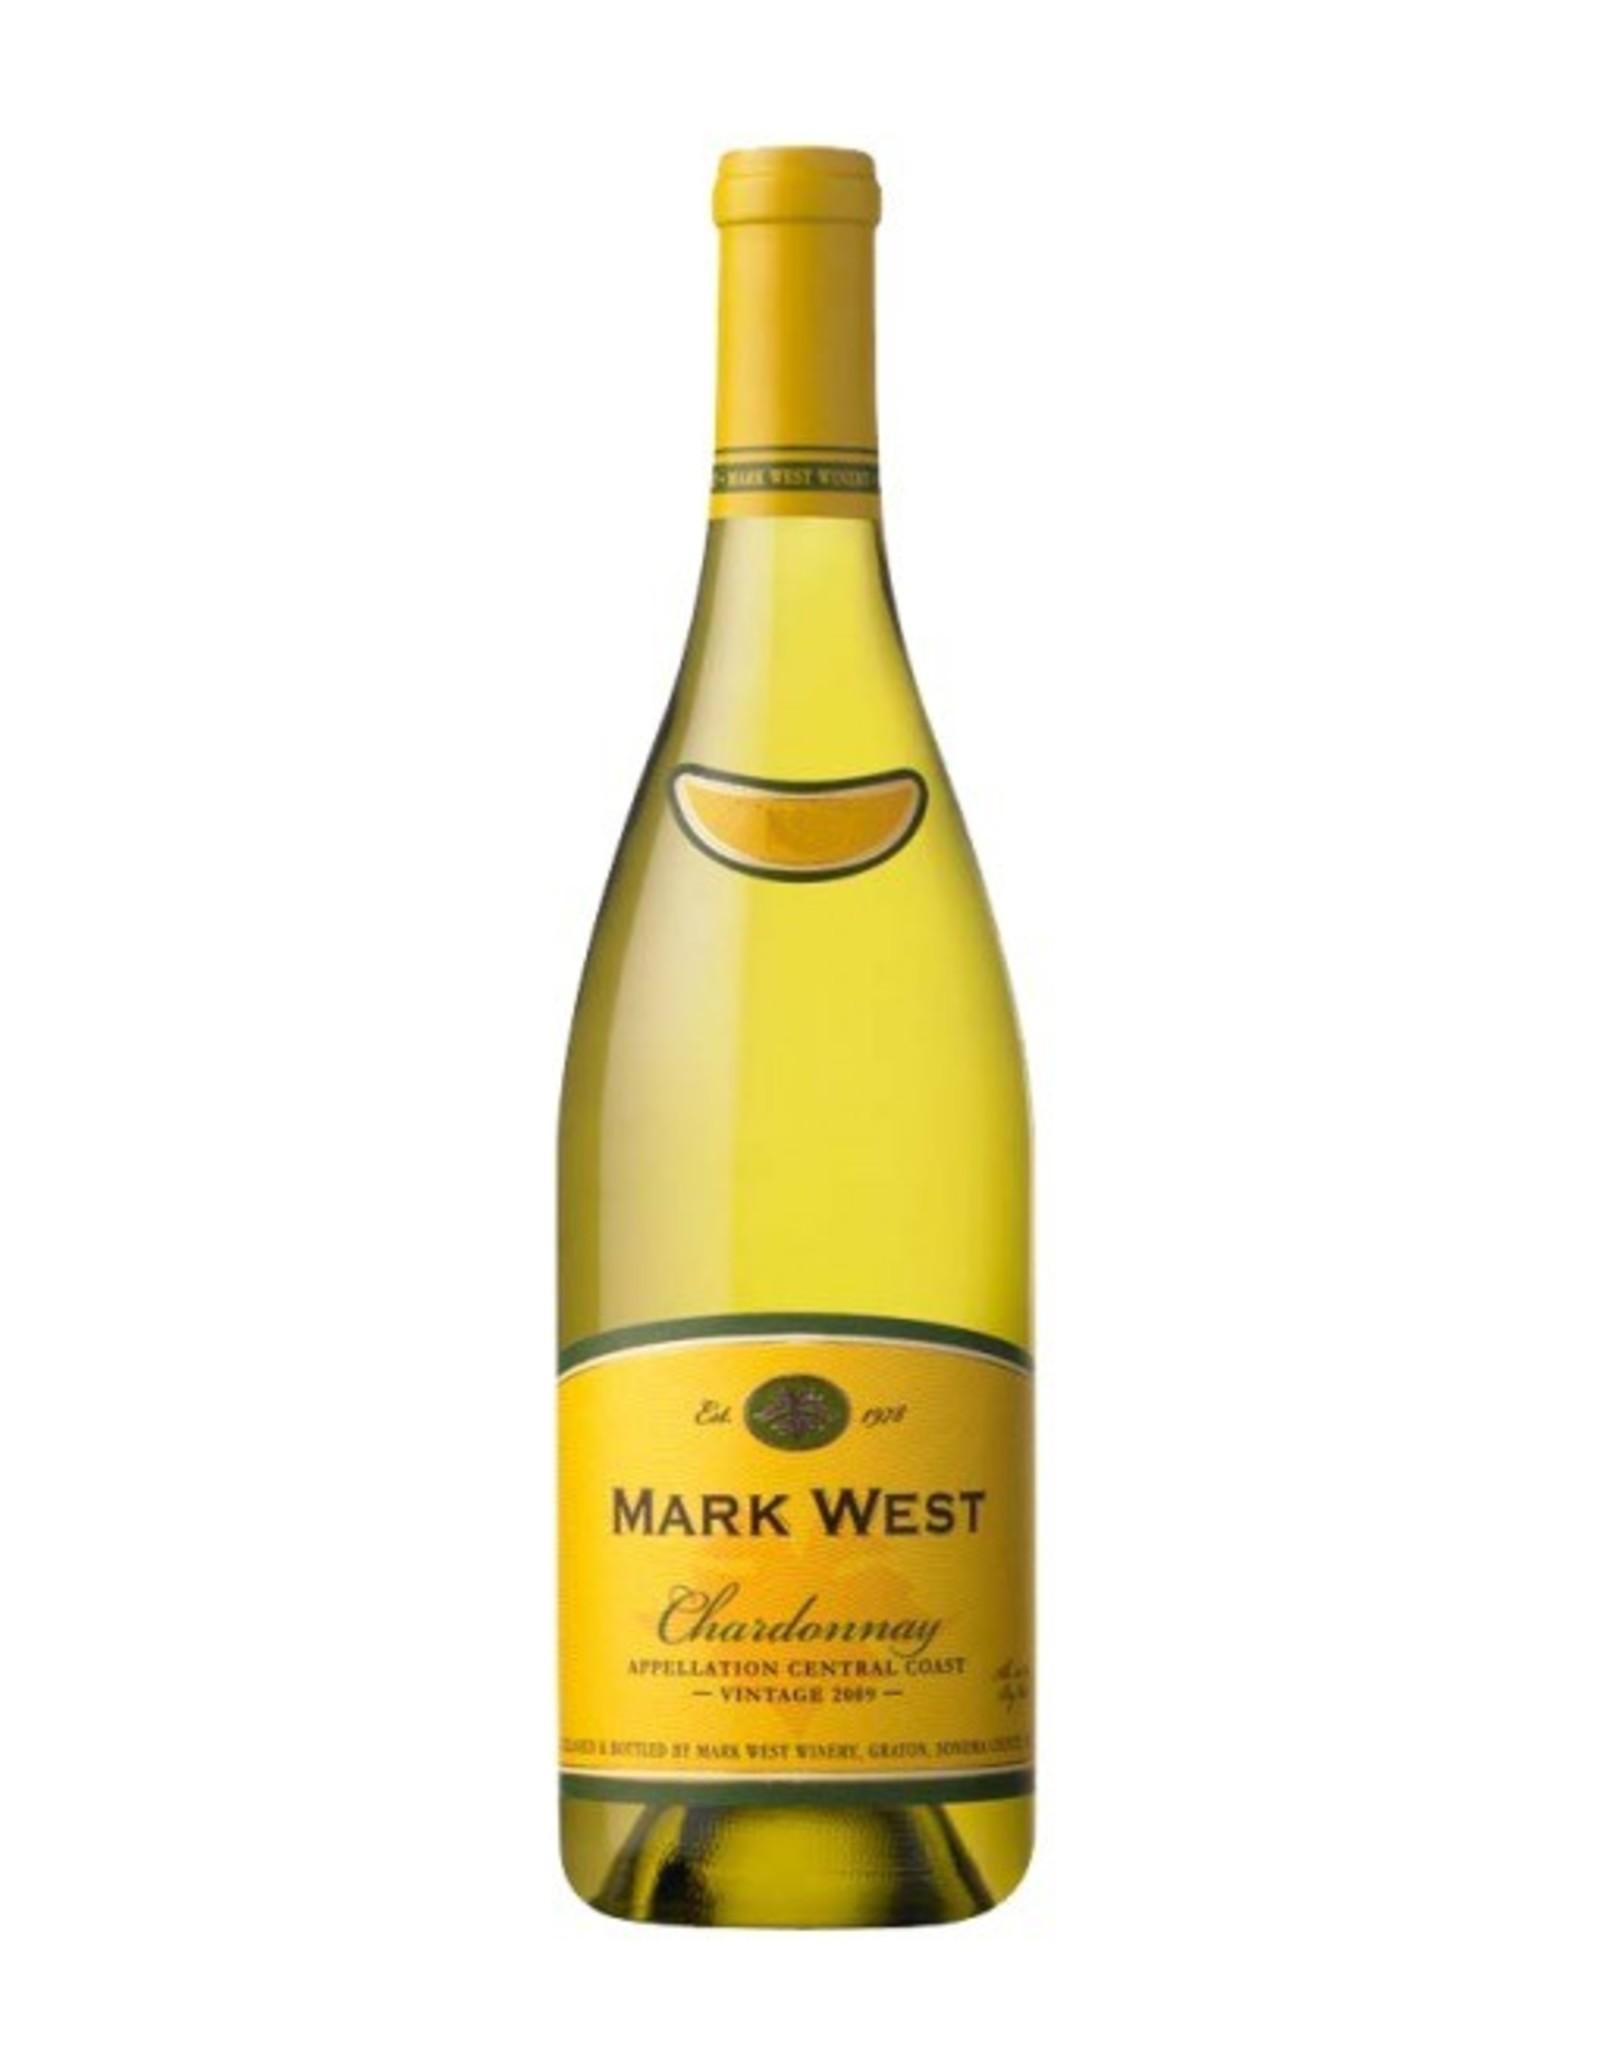 White Wine 2016, Mark West, Chardonnay, Multi-regional Blend, Coastal Appellations, California, 13.5% Alc, CTnr, TW88